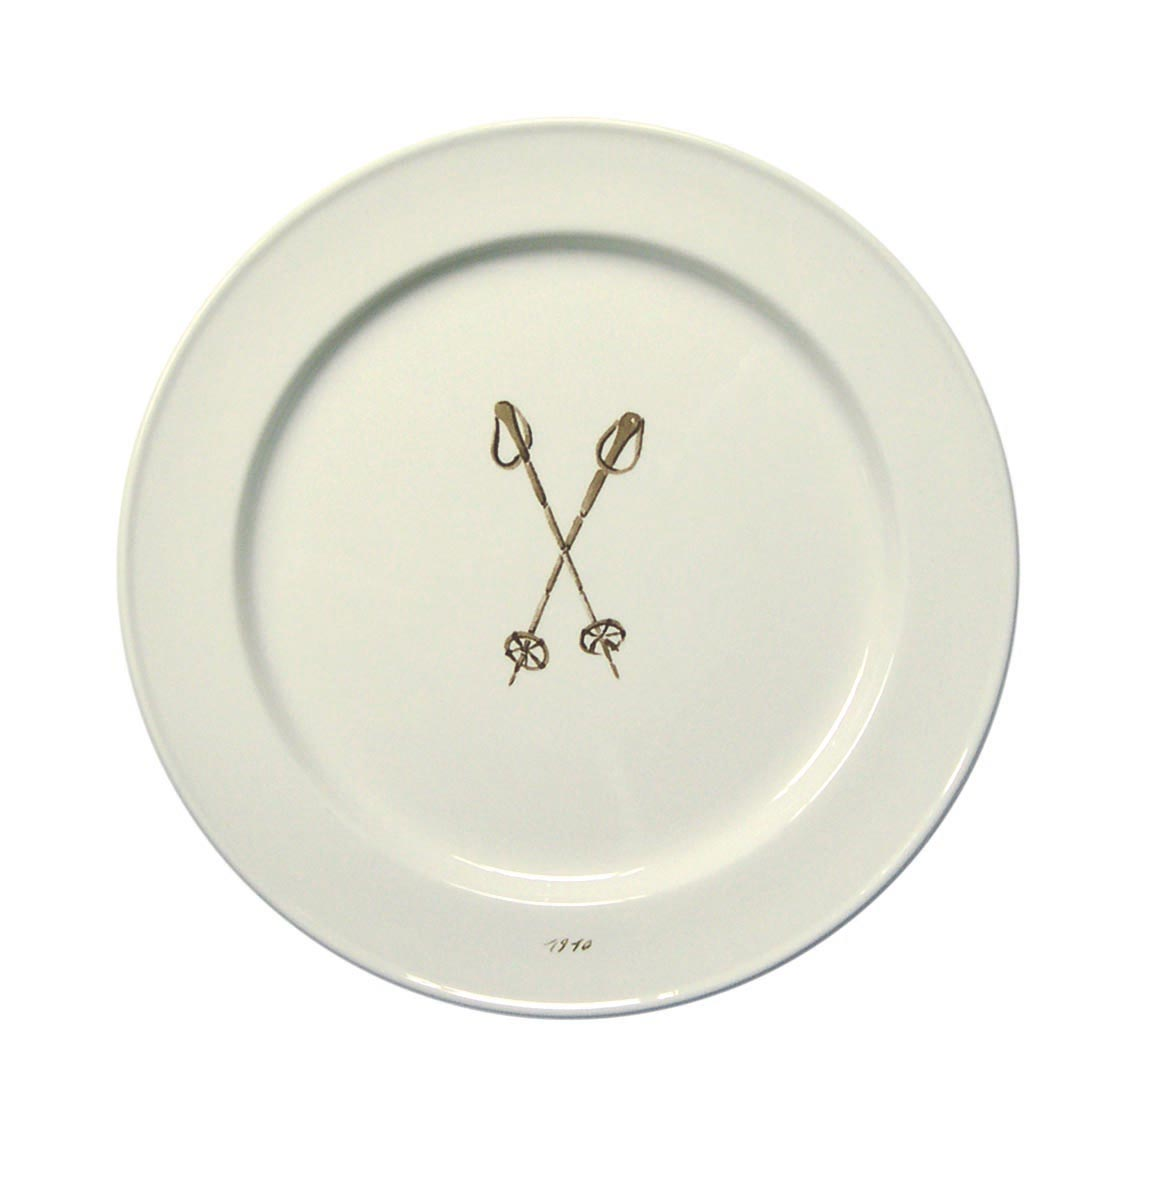 Chehoma Ascentielle Dinnerware Salad or Small Plate Ski Pole-8.39 x .98 h